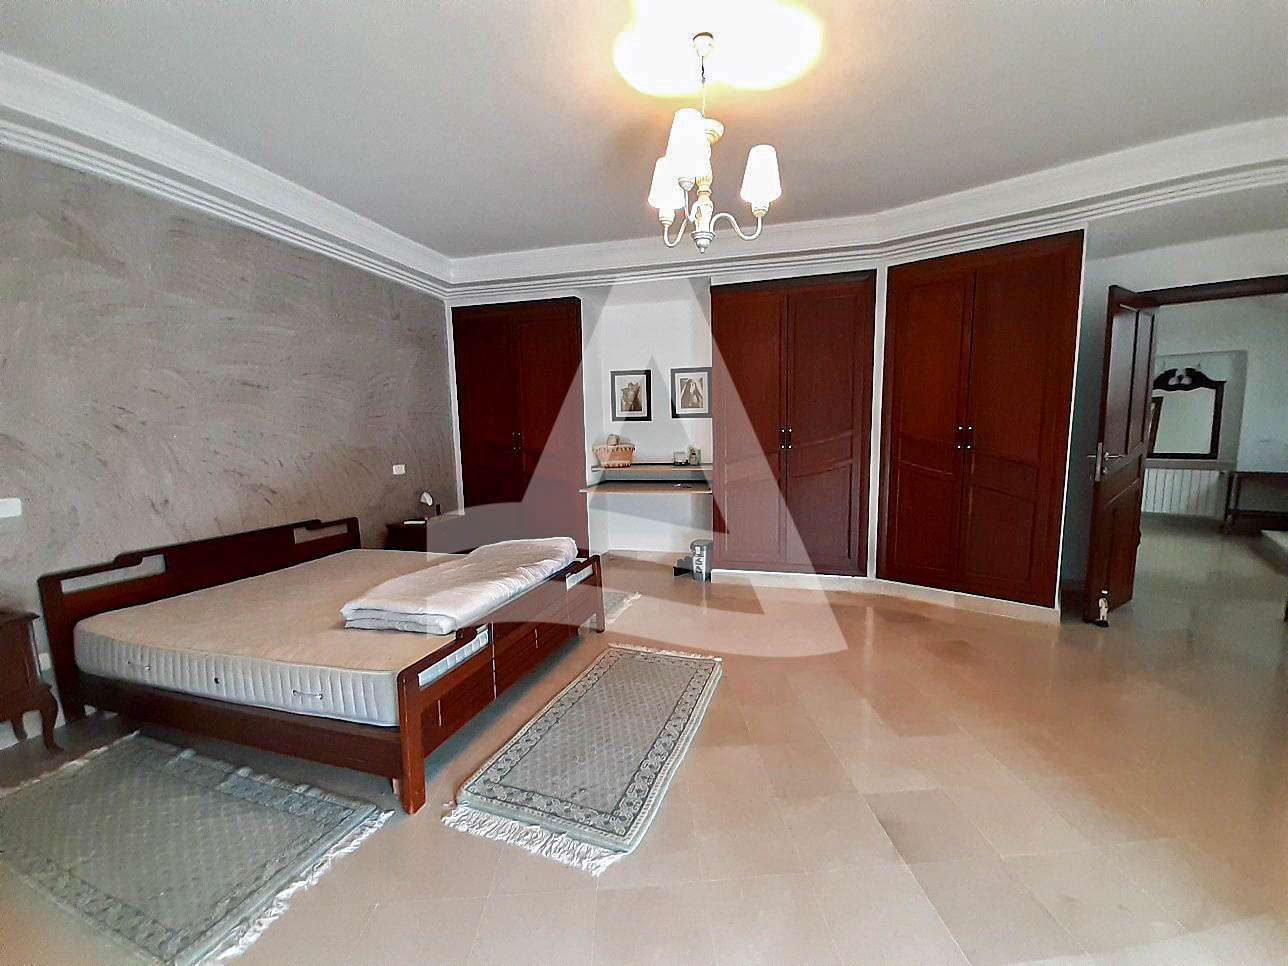 httpss3.amazonaws.comlogimoaws8582999581618661360appartement_la_marsa_tunis_3_sur_14-1